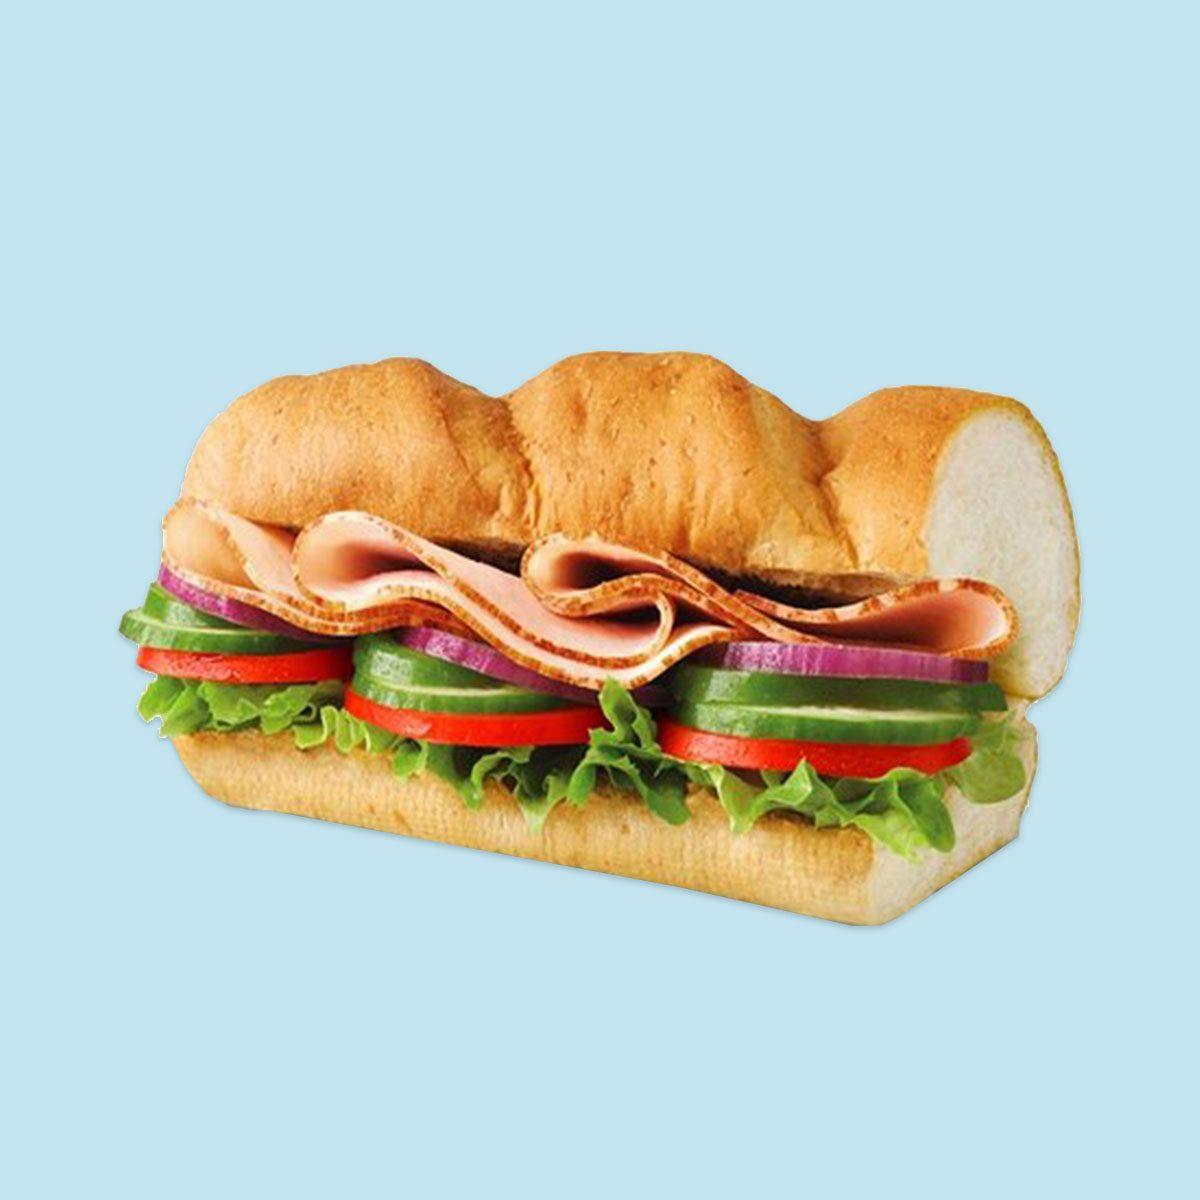 Subway's 6-inch Turkey Sub